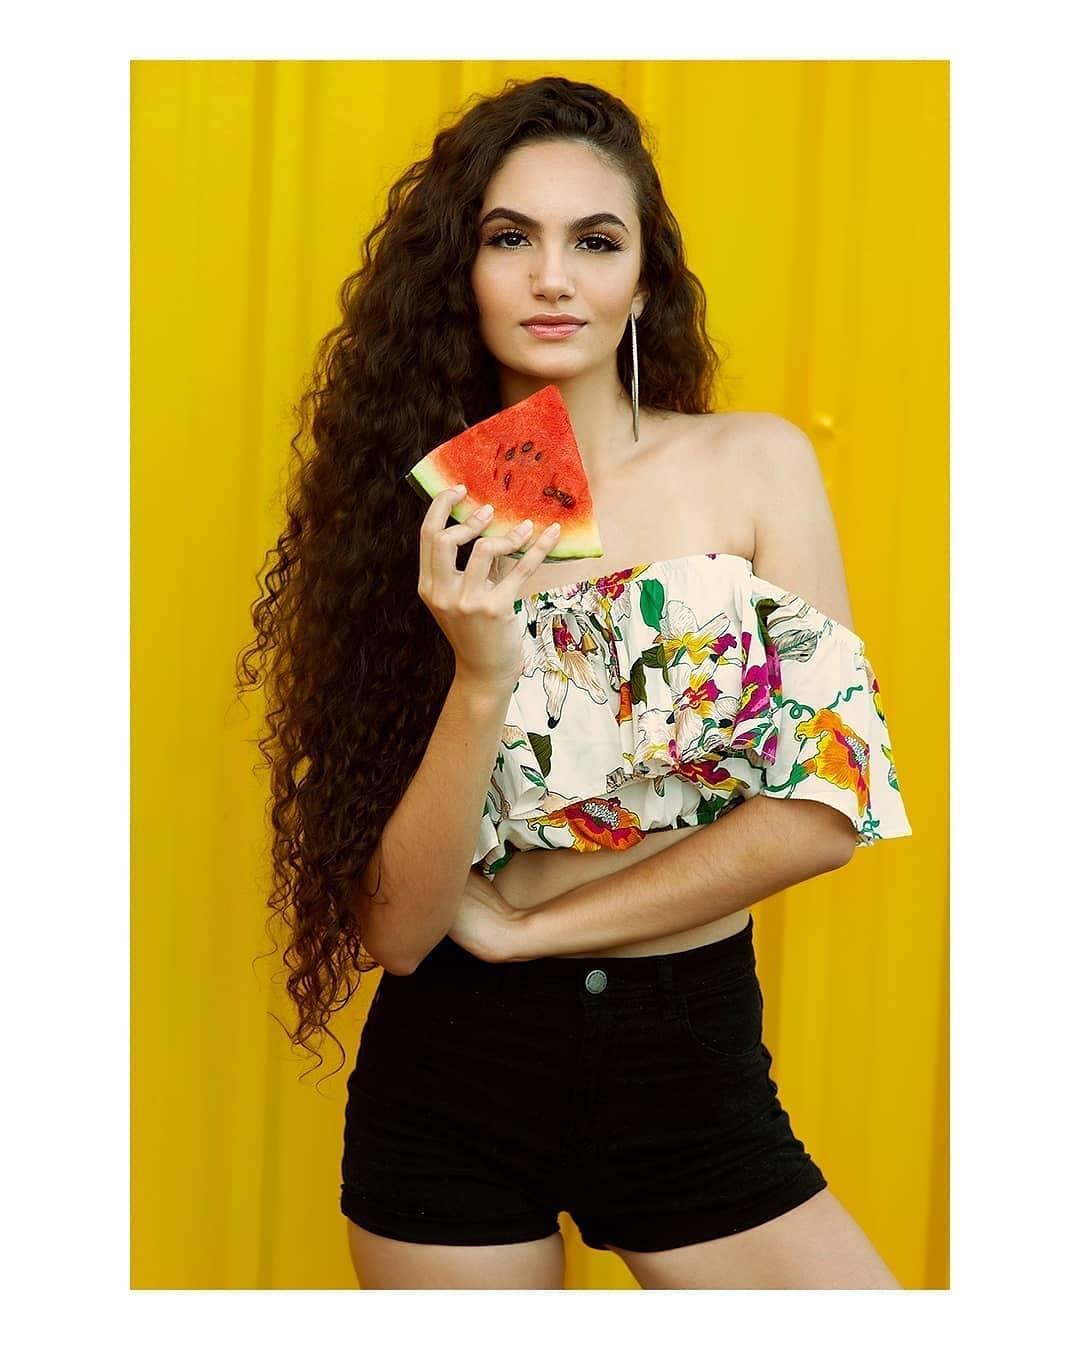 maria luiza marim, miss brasil teen americas 2019. 59216010